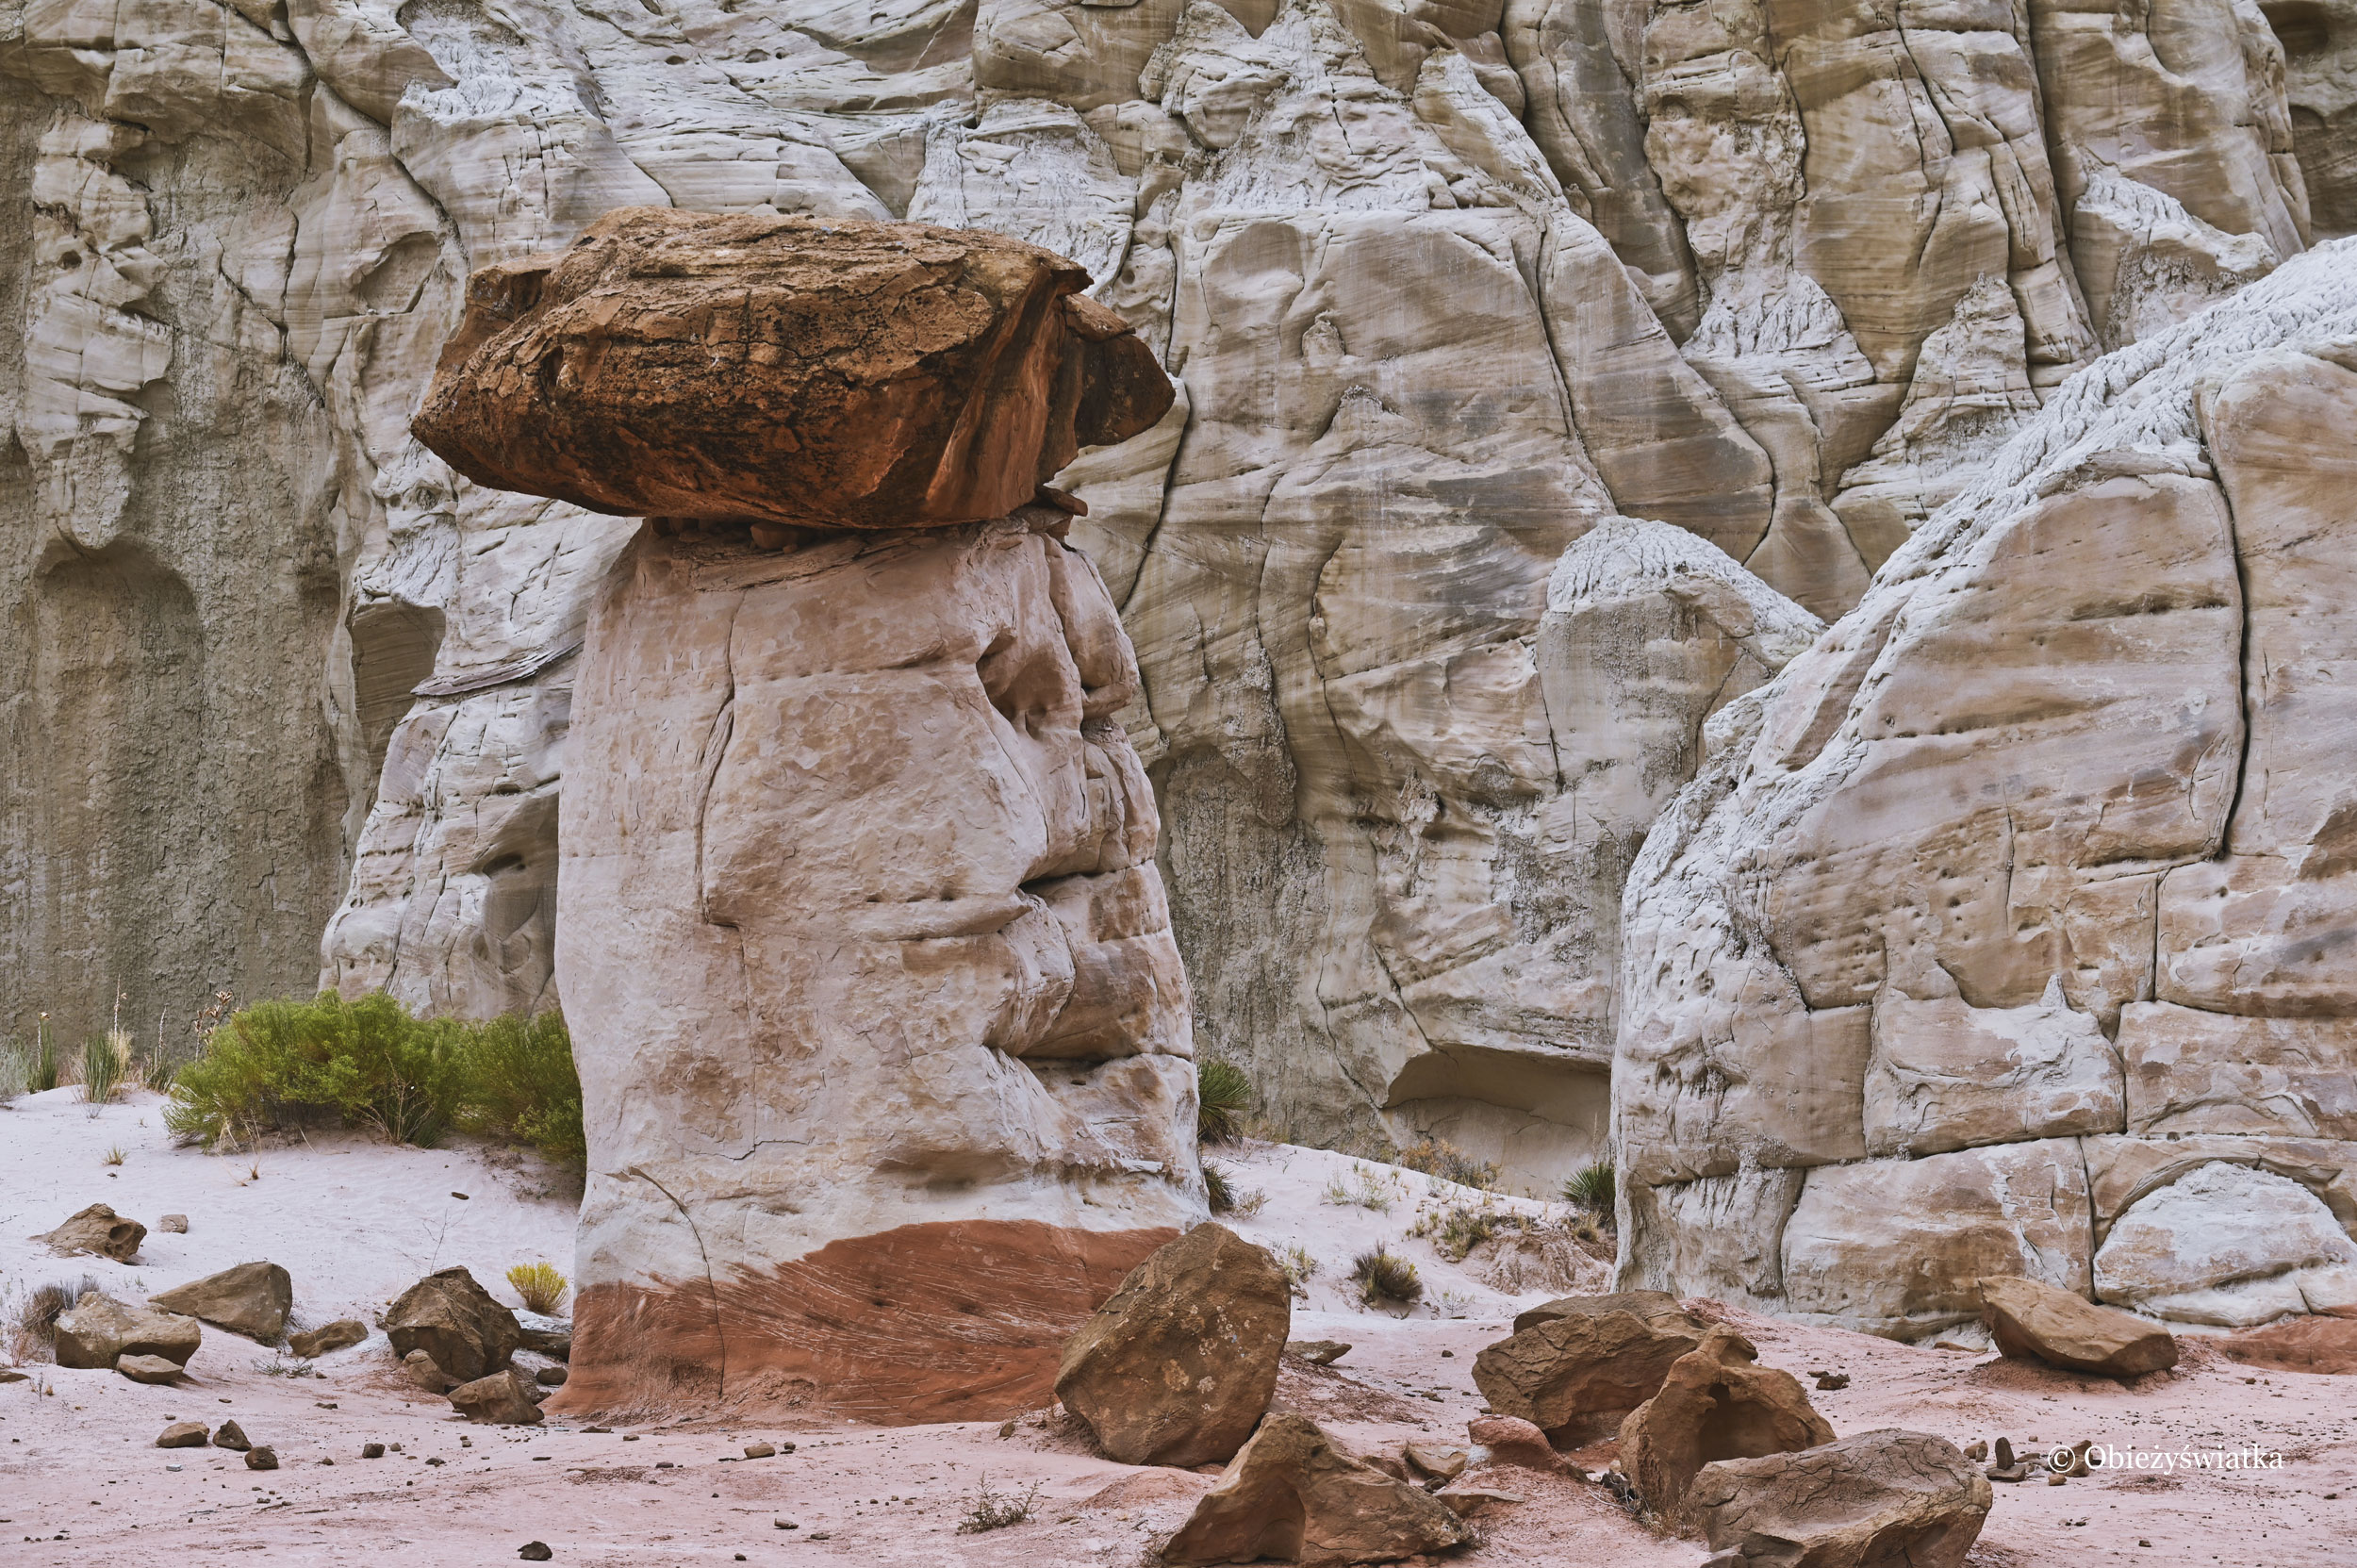 Jasna nóżka, ciemny kapelusz, Hoodoos, Toadstools Trail, Utah